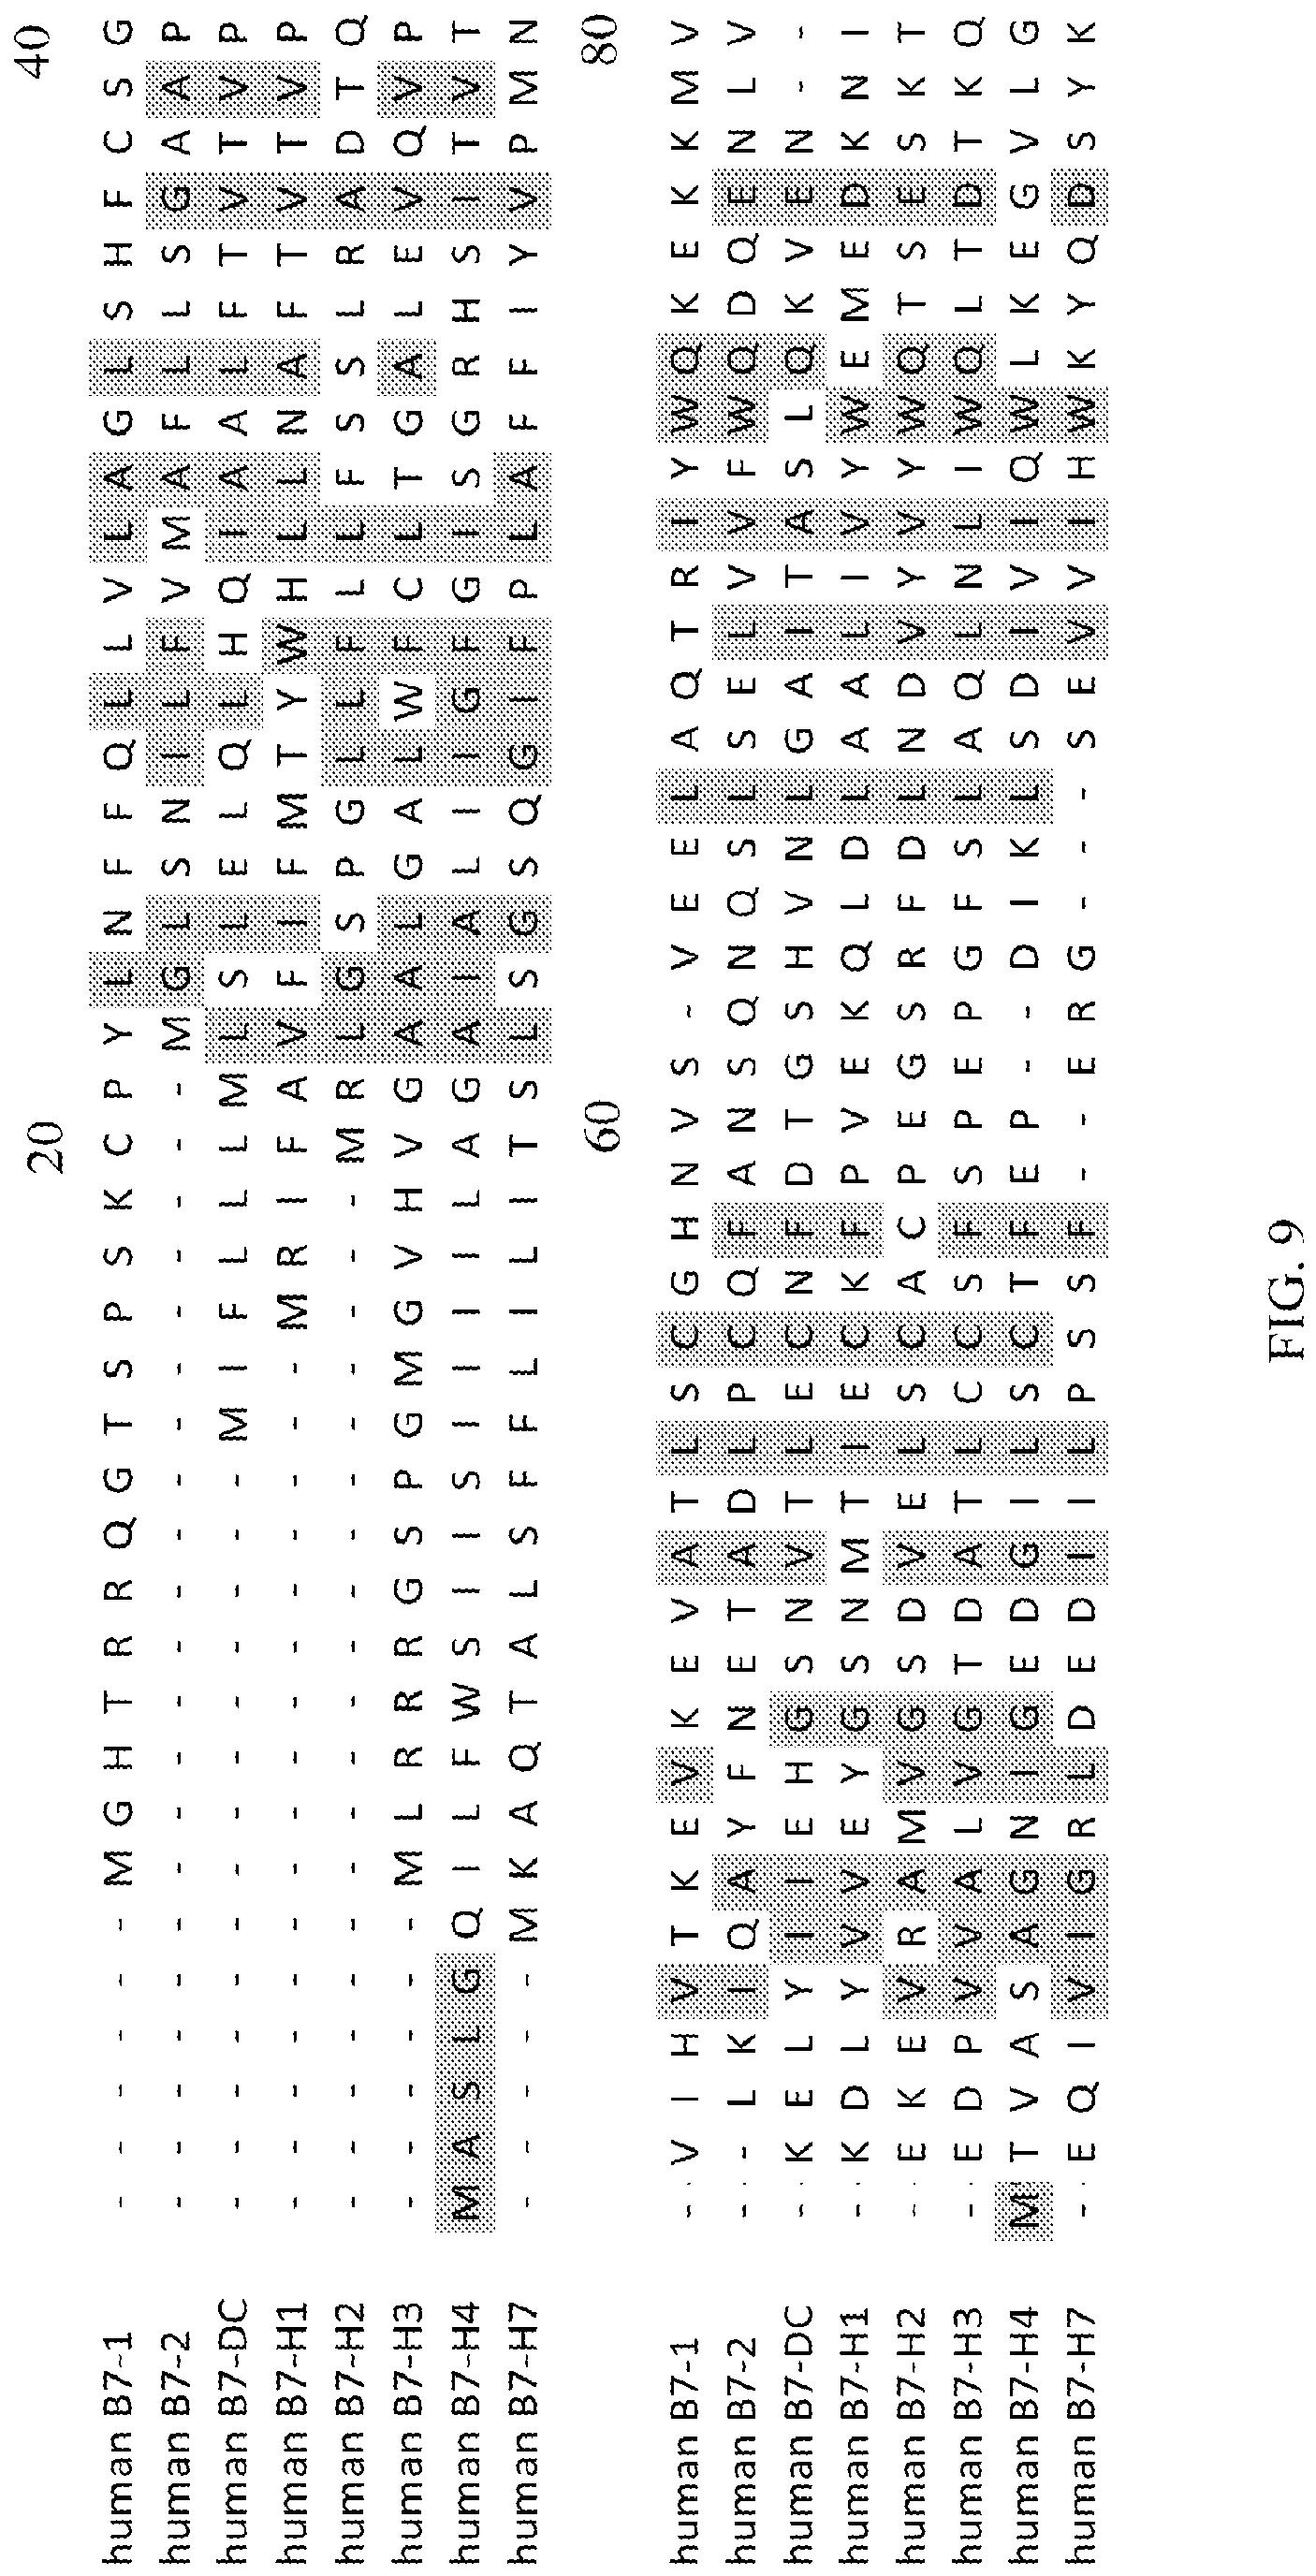 METHODS OF MODULATING IMMUNE FUNCTION WITH ANTI-B7-H7CR ANTIBODIES